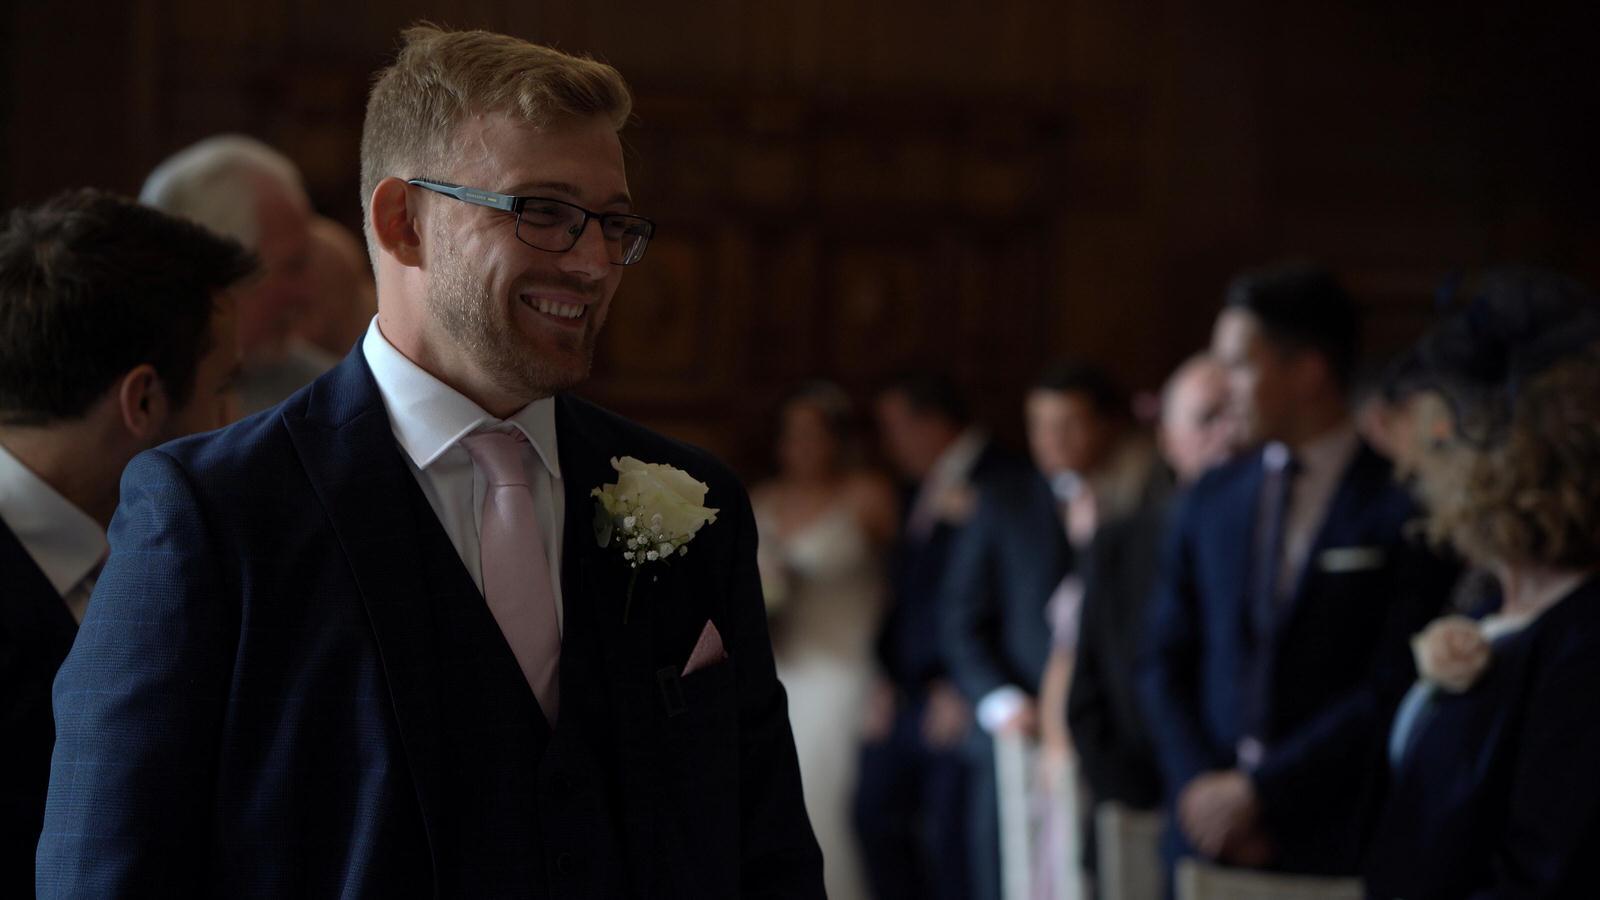 groom smiles as he waits for bride to walk down aisle